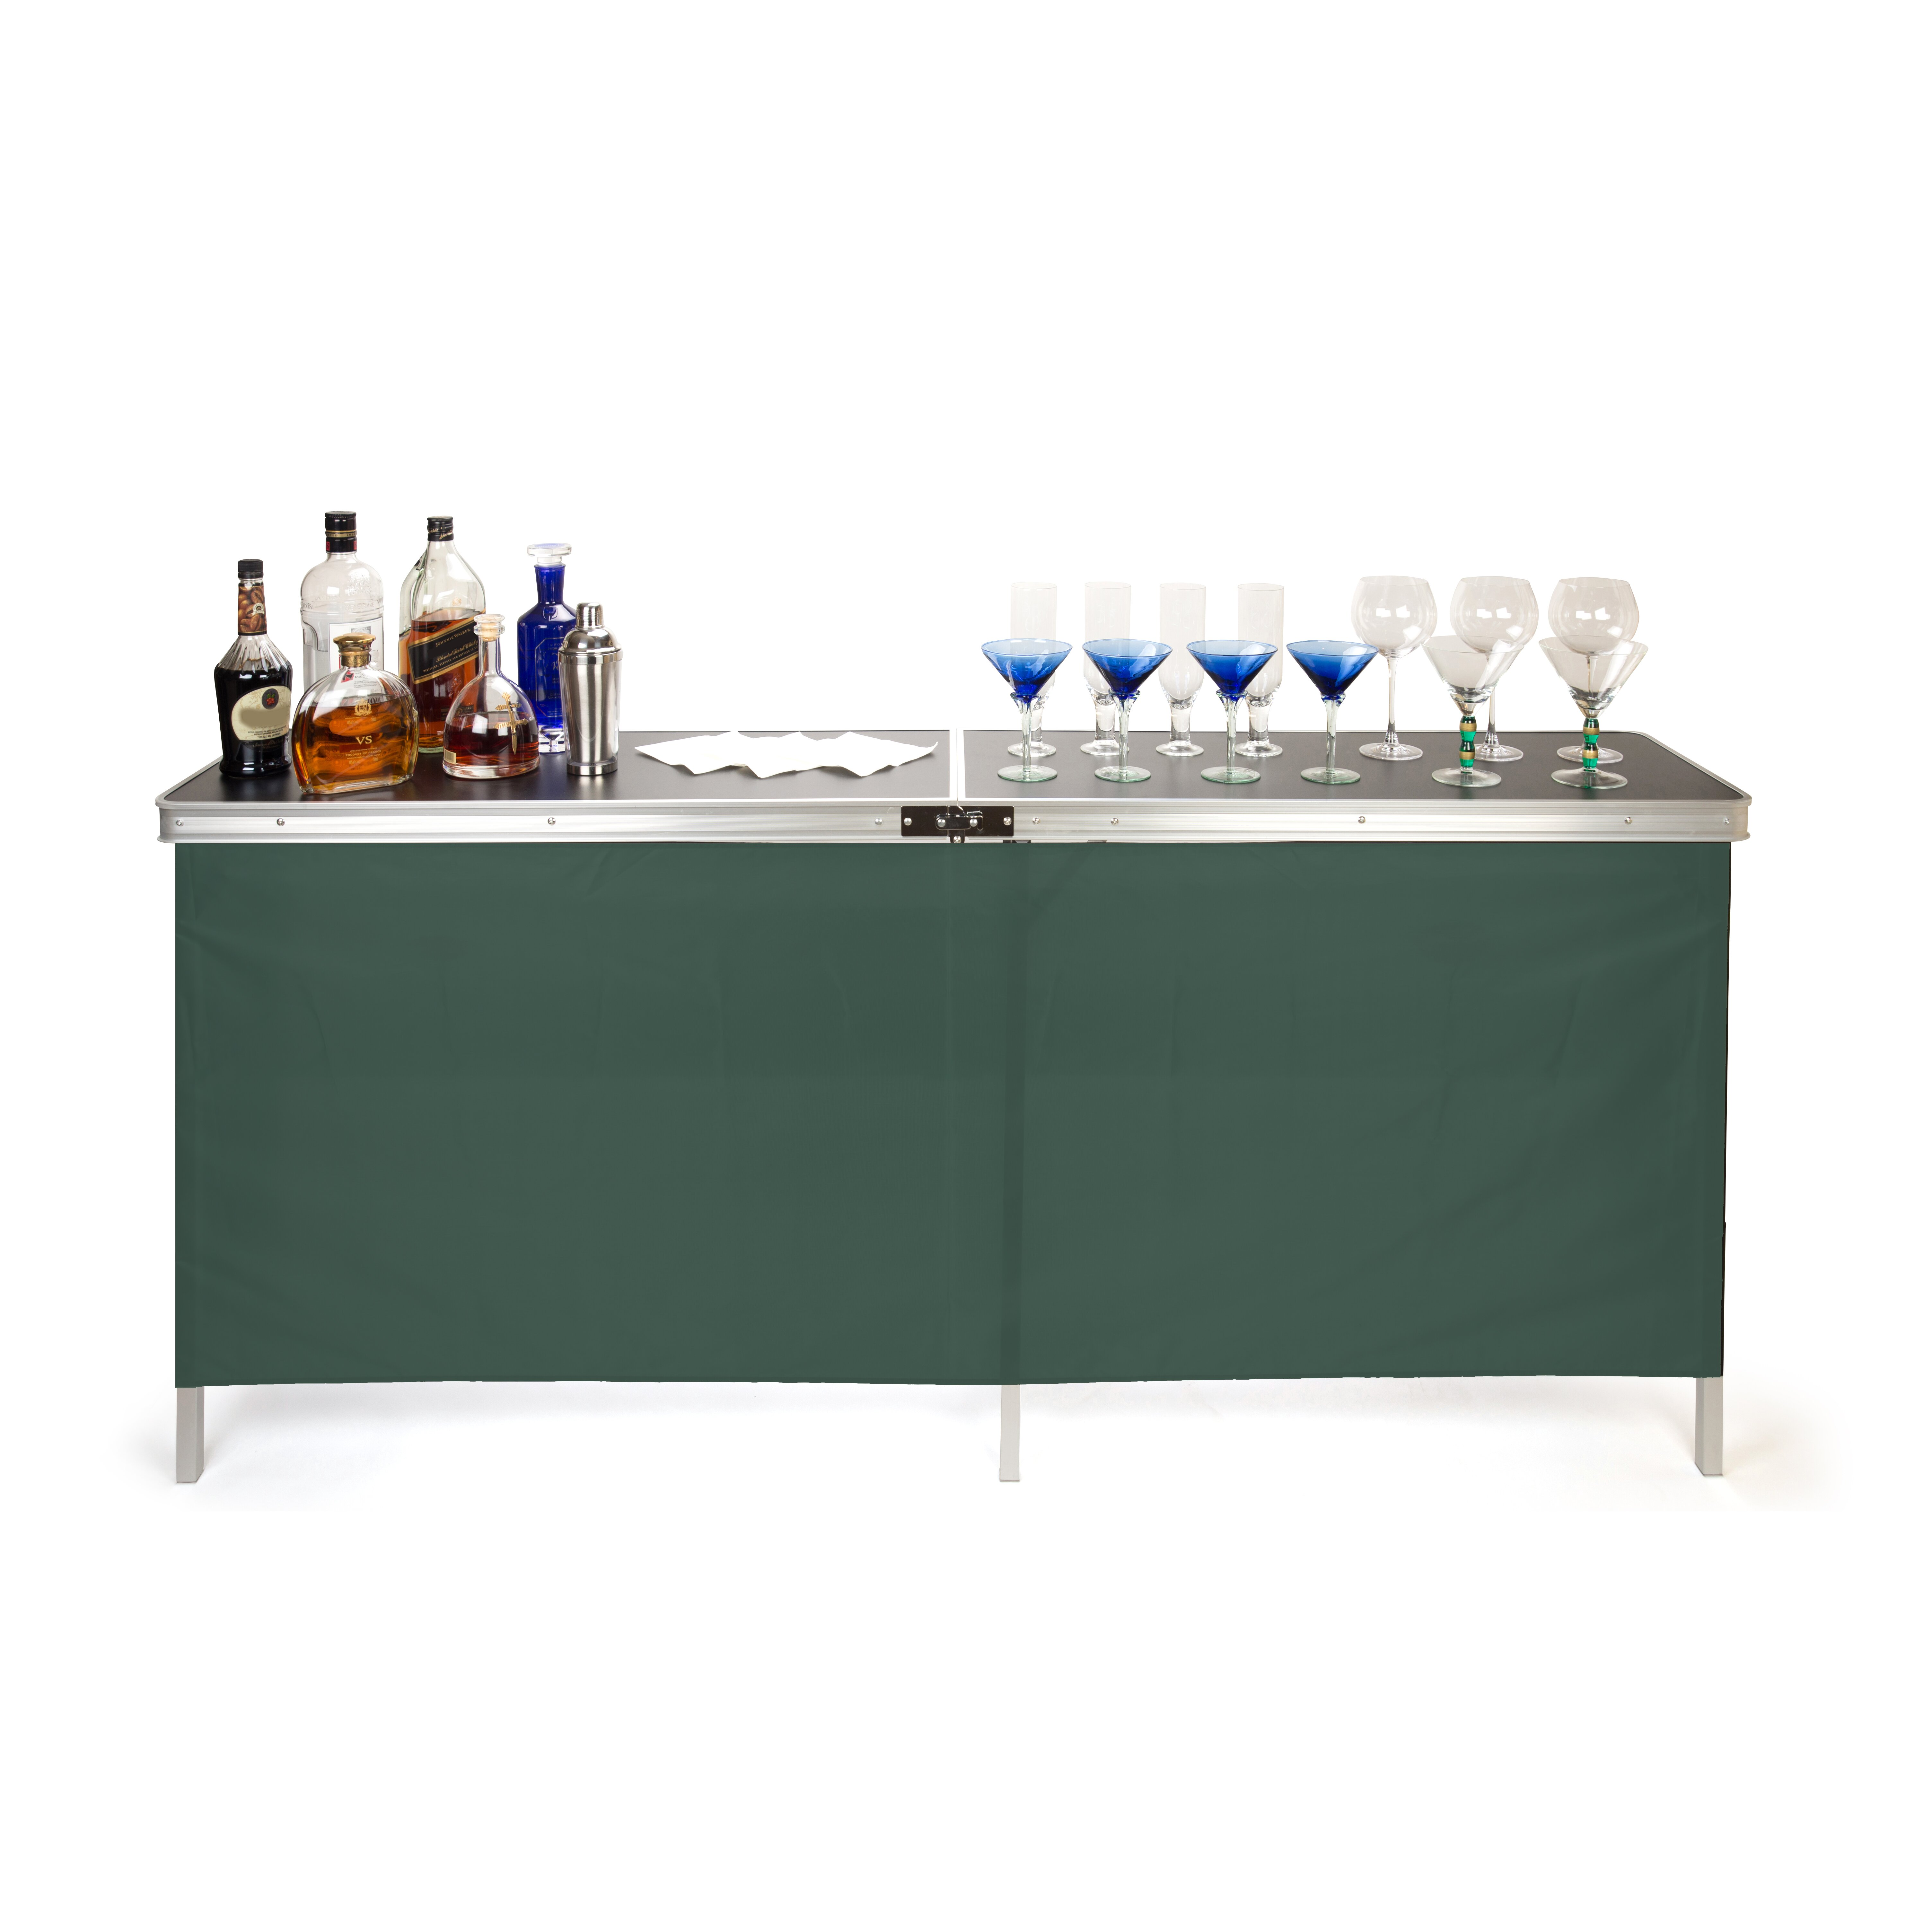 Trademark Innovations Portable Bar Table Reviews Wayfair